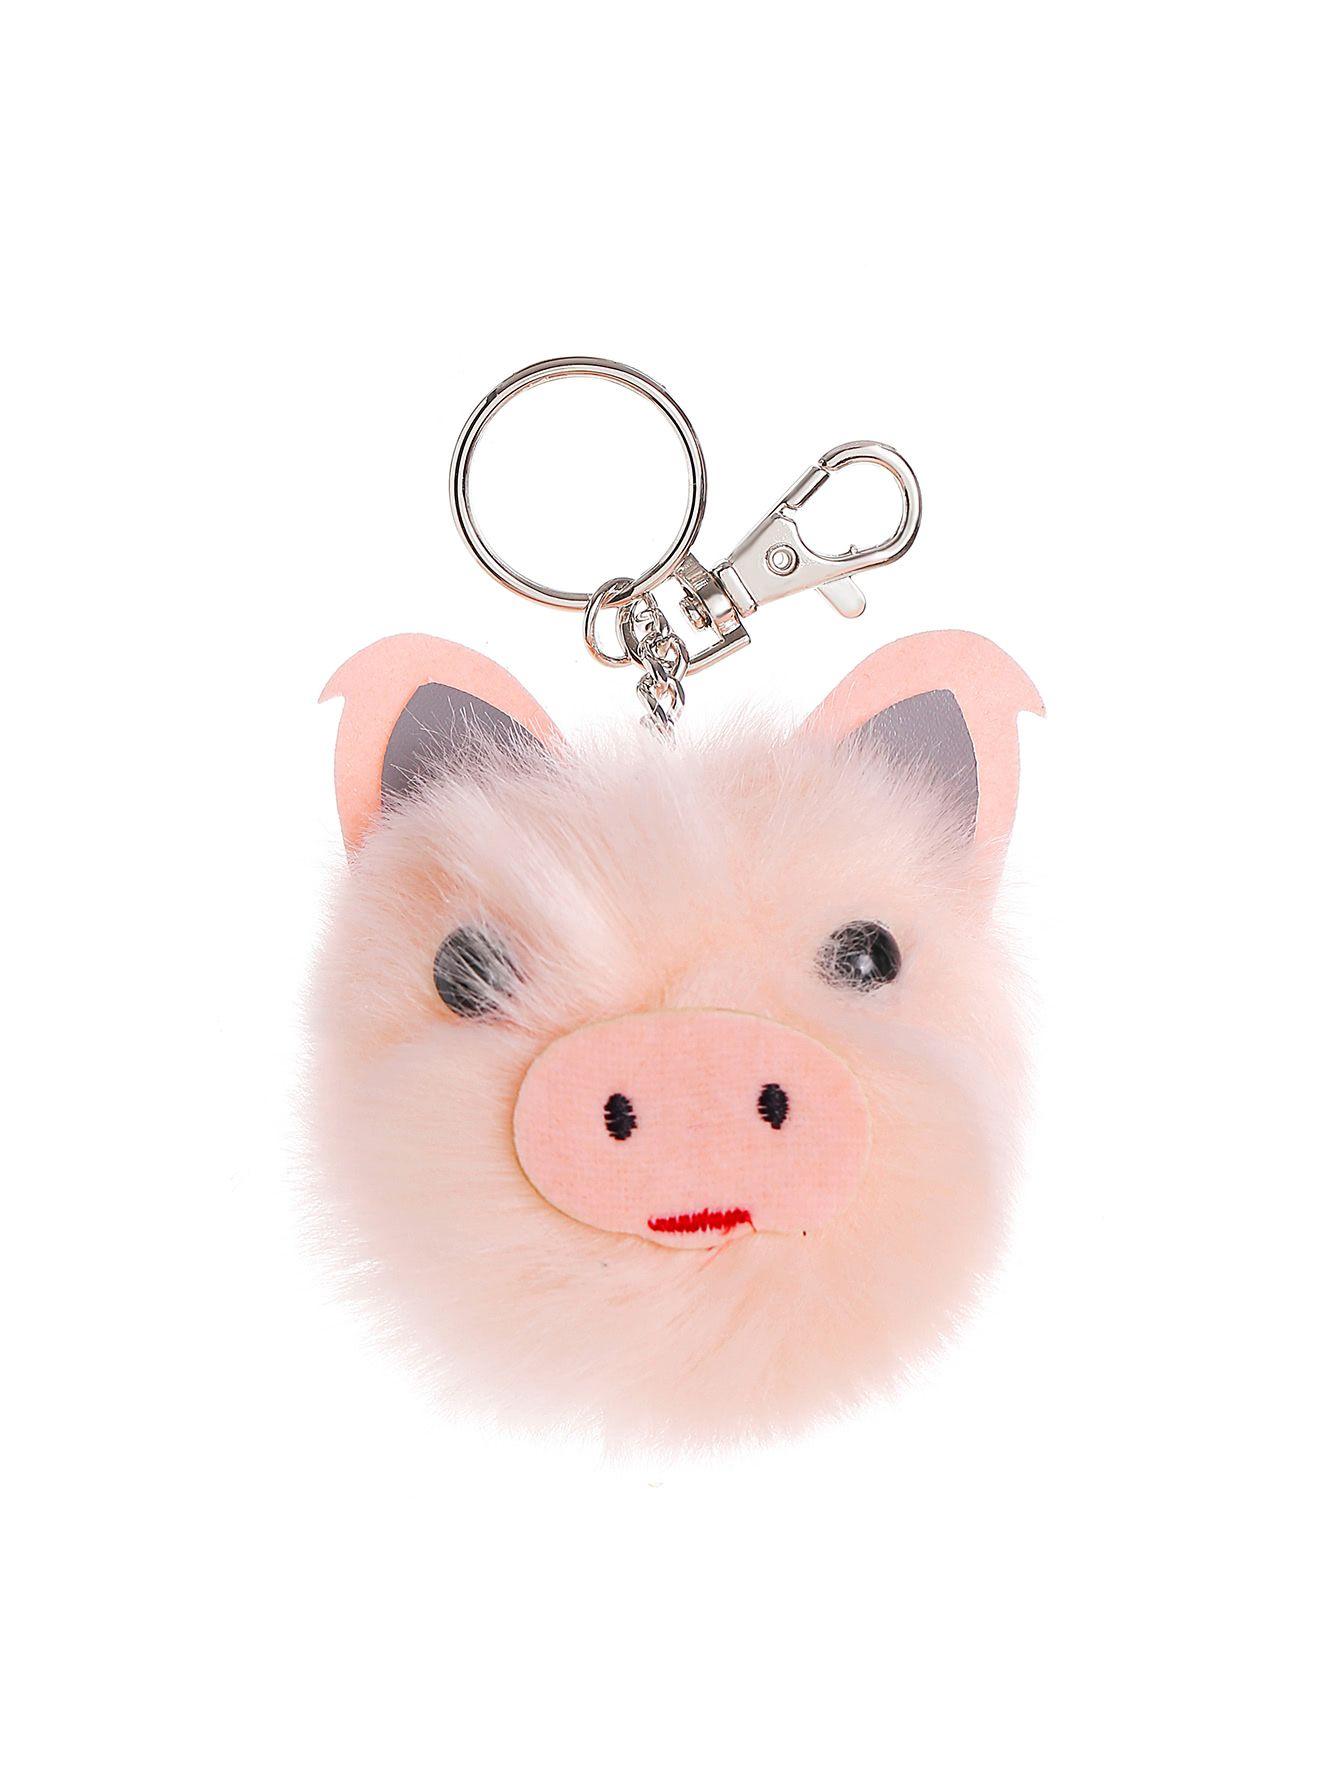 25d9b70a0a Shop Pig Shaped Pom Pom Keychain online. SheIn offers Pig Shaped Pom Pom  Keychain & more to fit your fashionable needs.